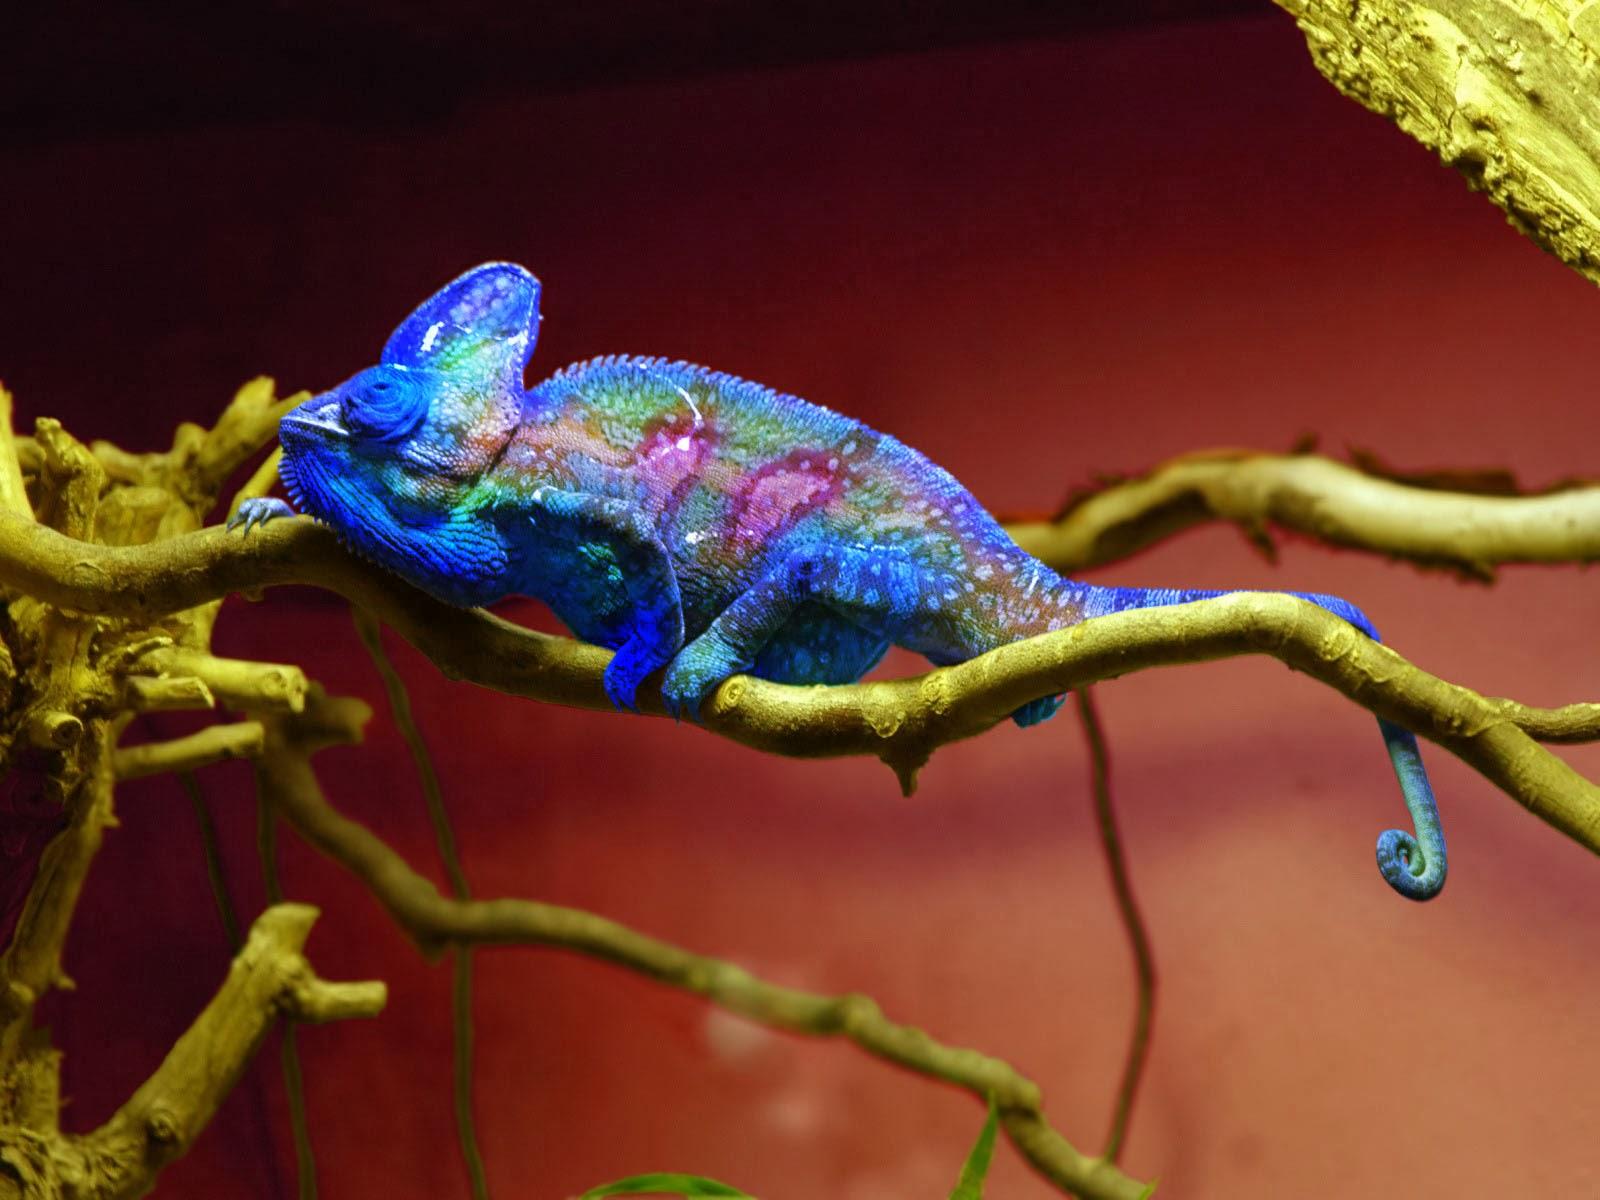 Colorful Chameleons - Lessons - Tes Teach